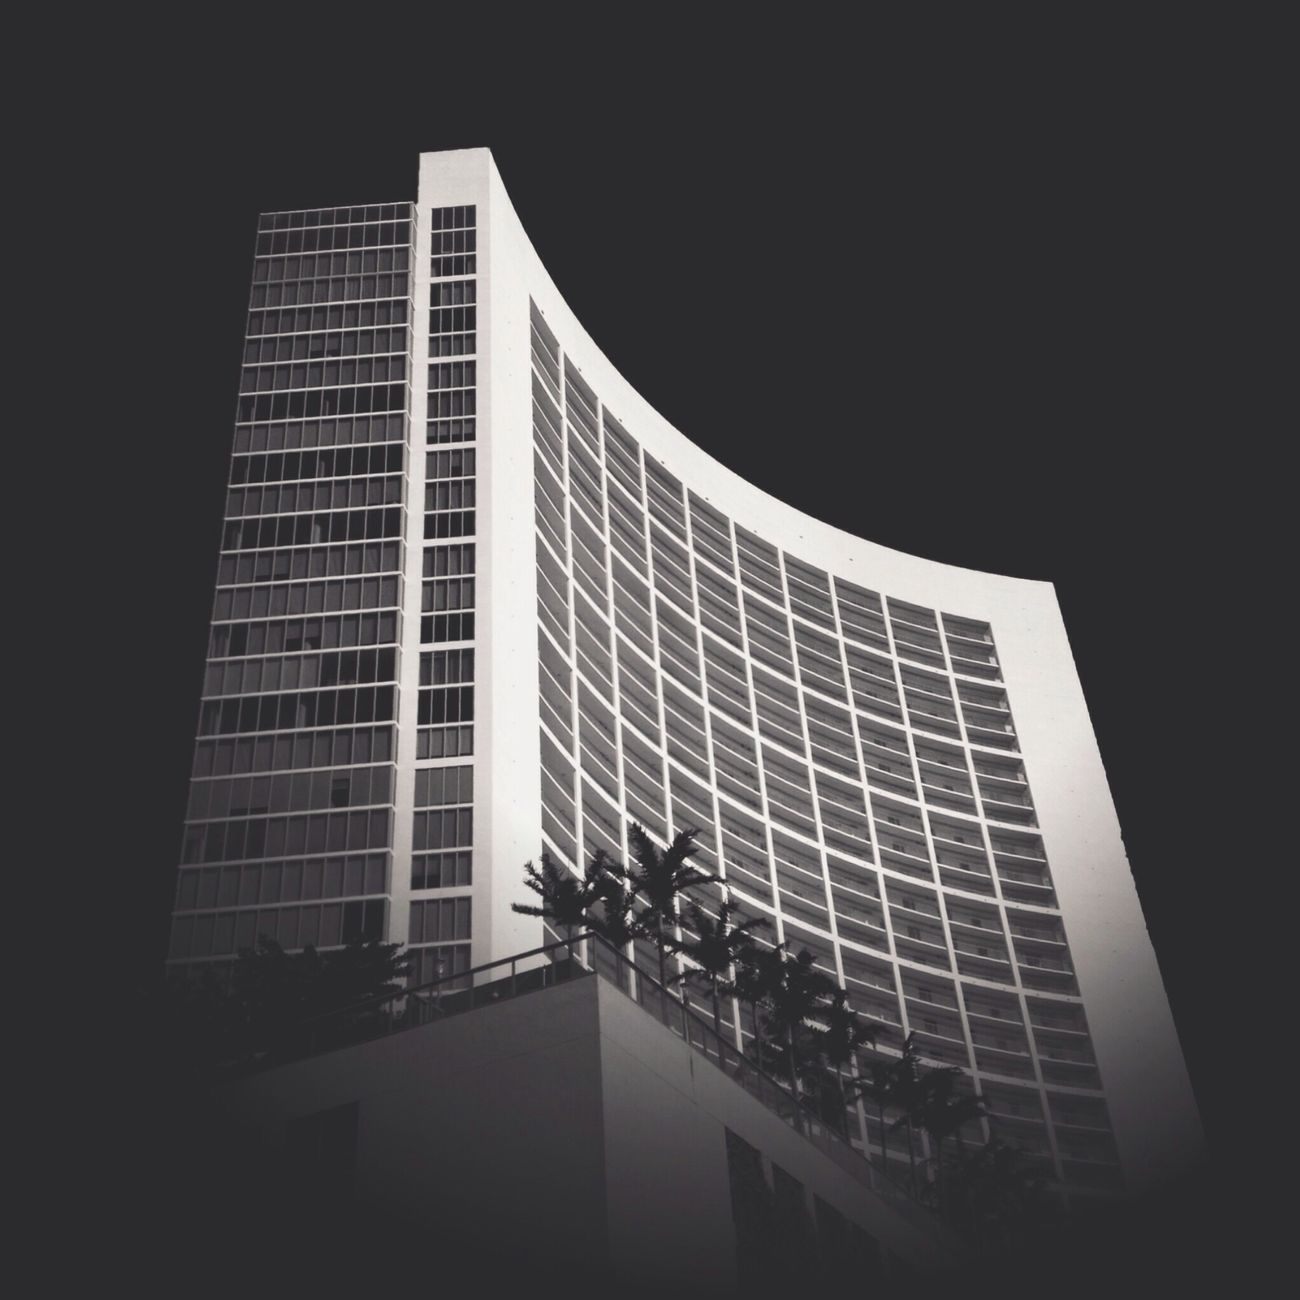 Blackandwhite Architectural Detail Monochrome Architecture Shootermag